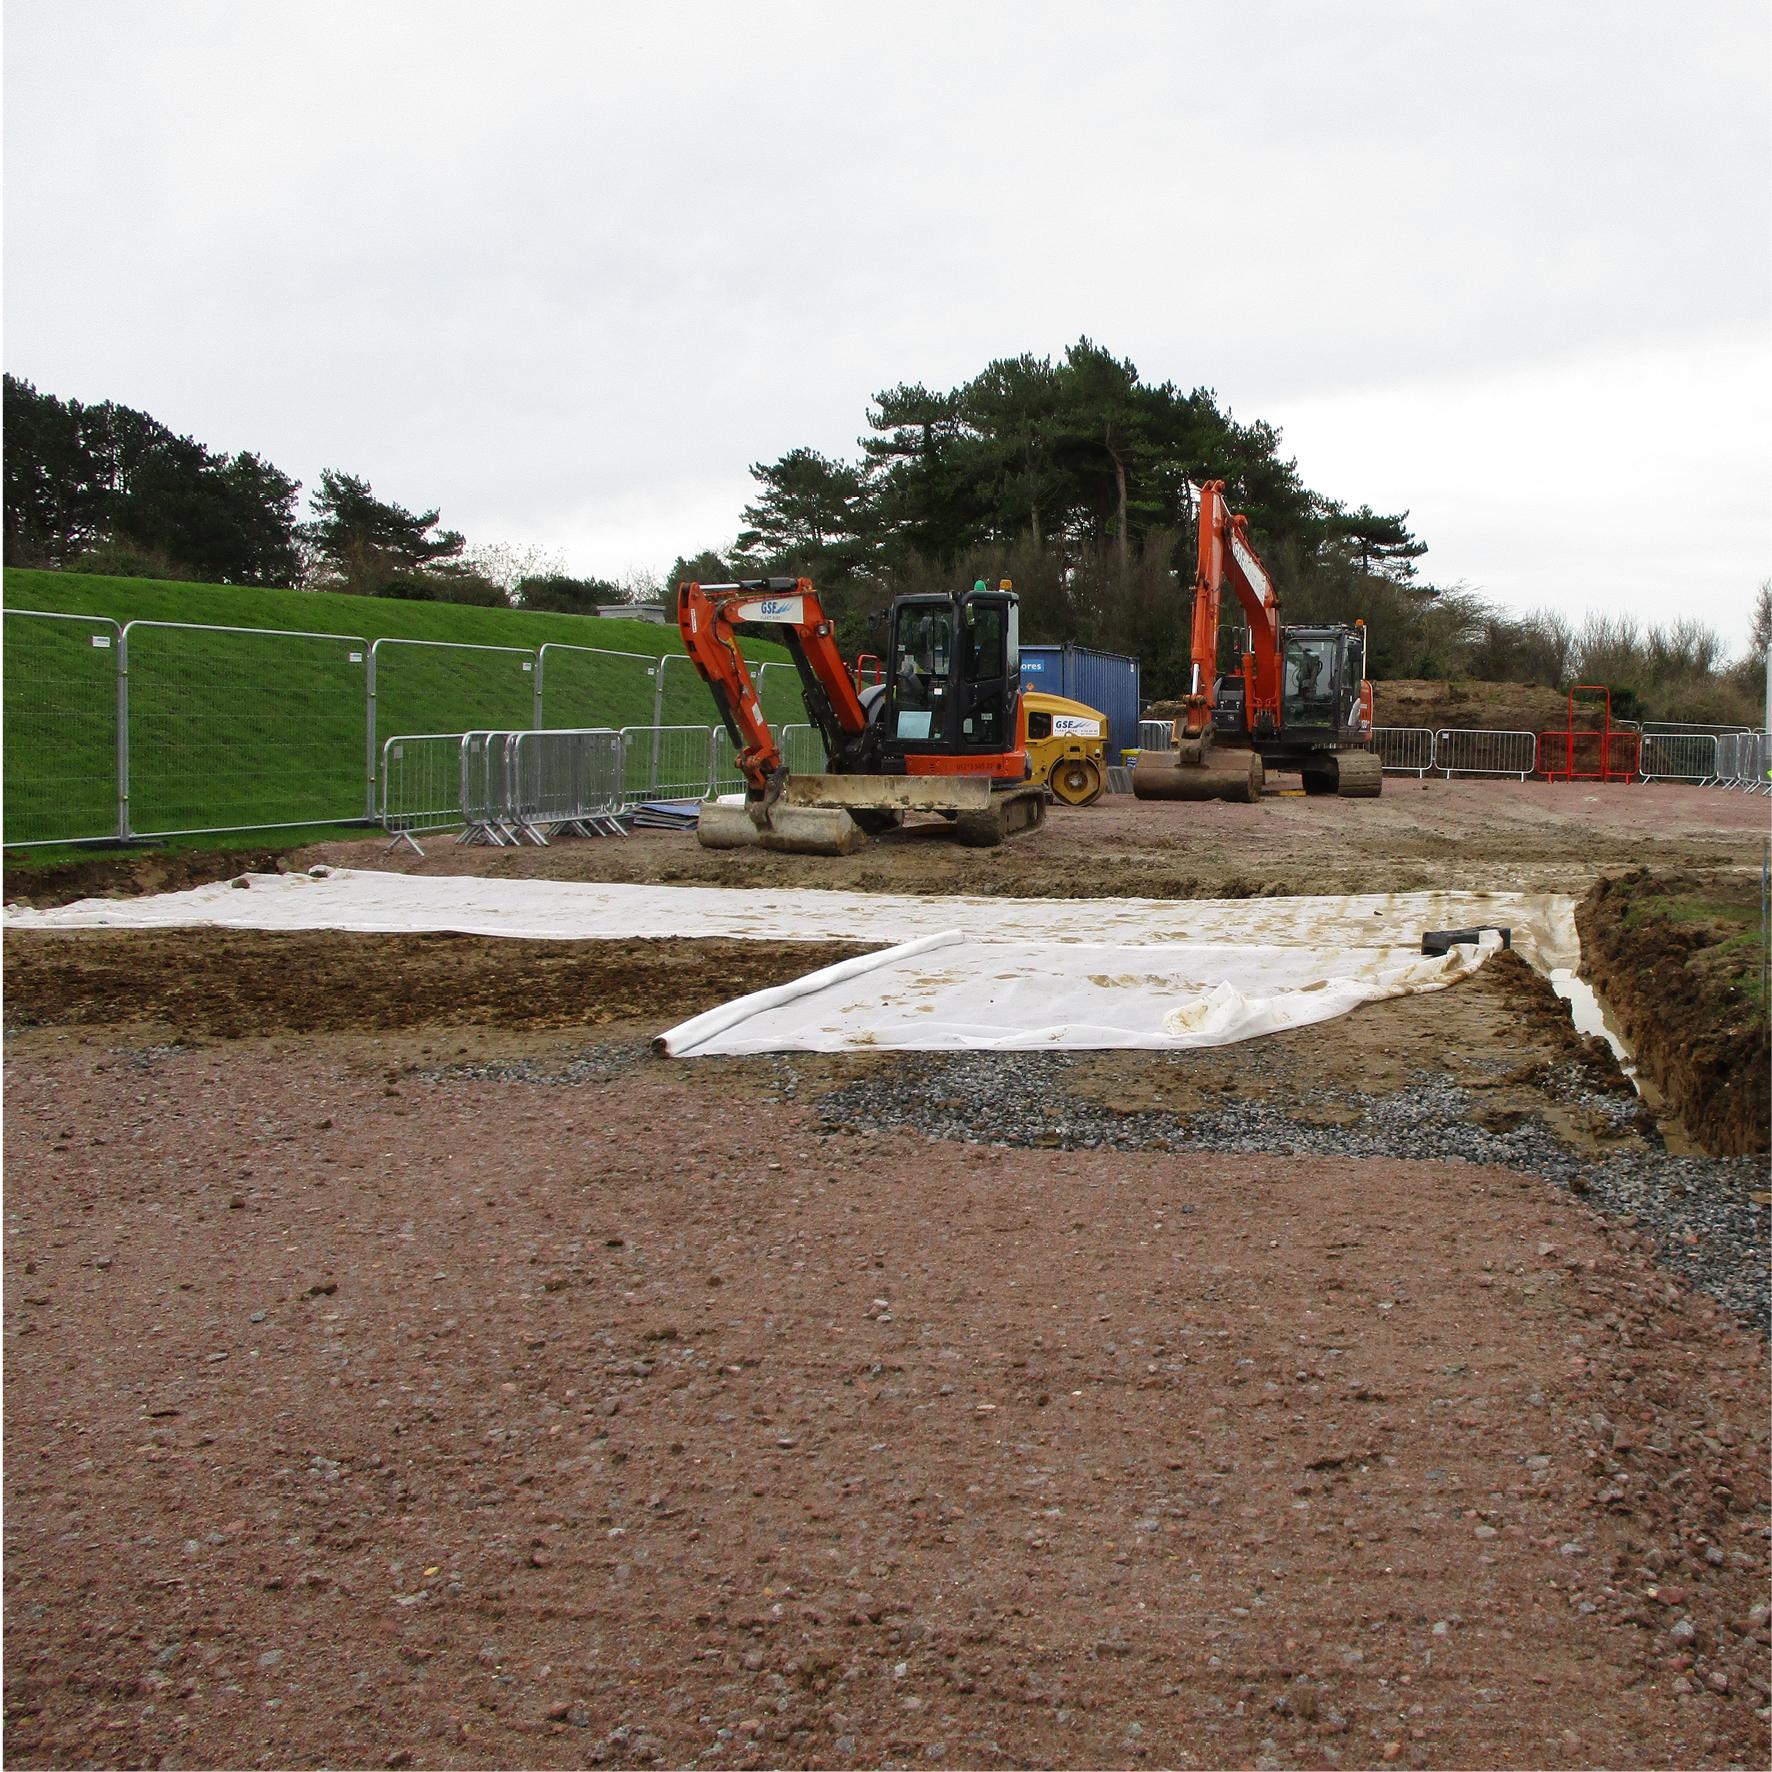 Downsgate Pumping Station, Enabling Works